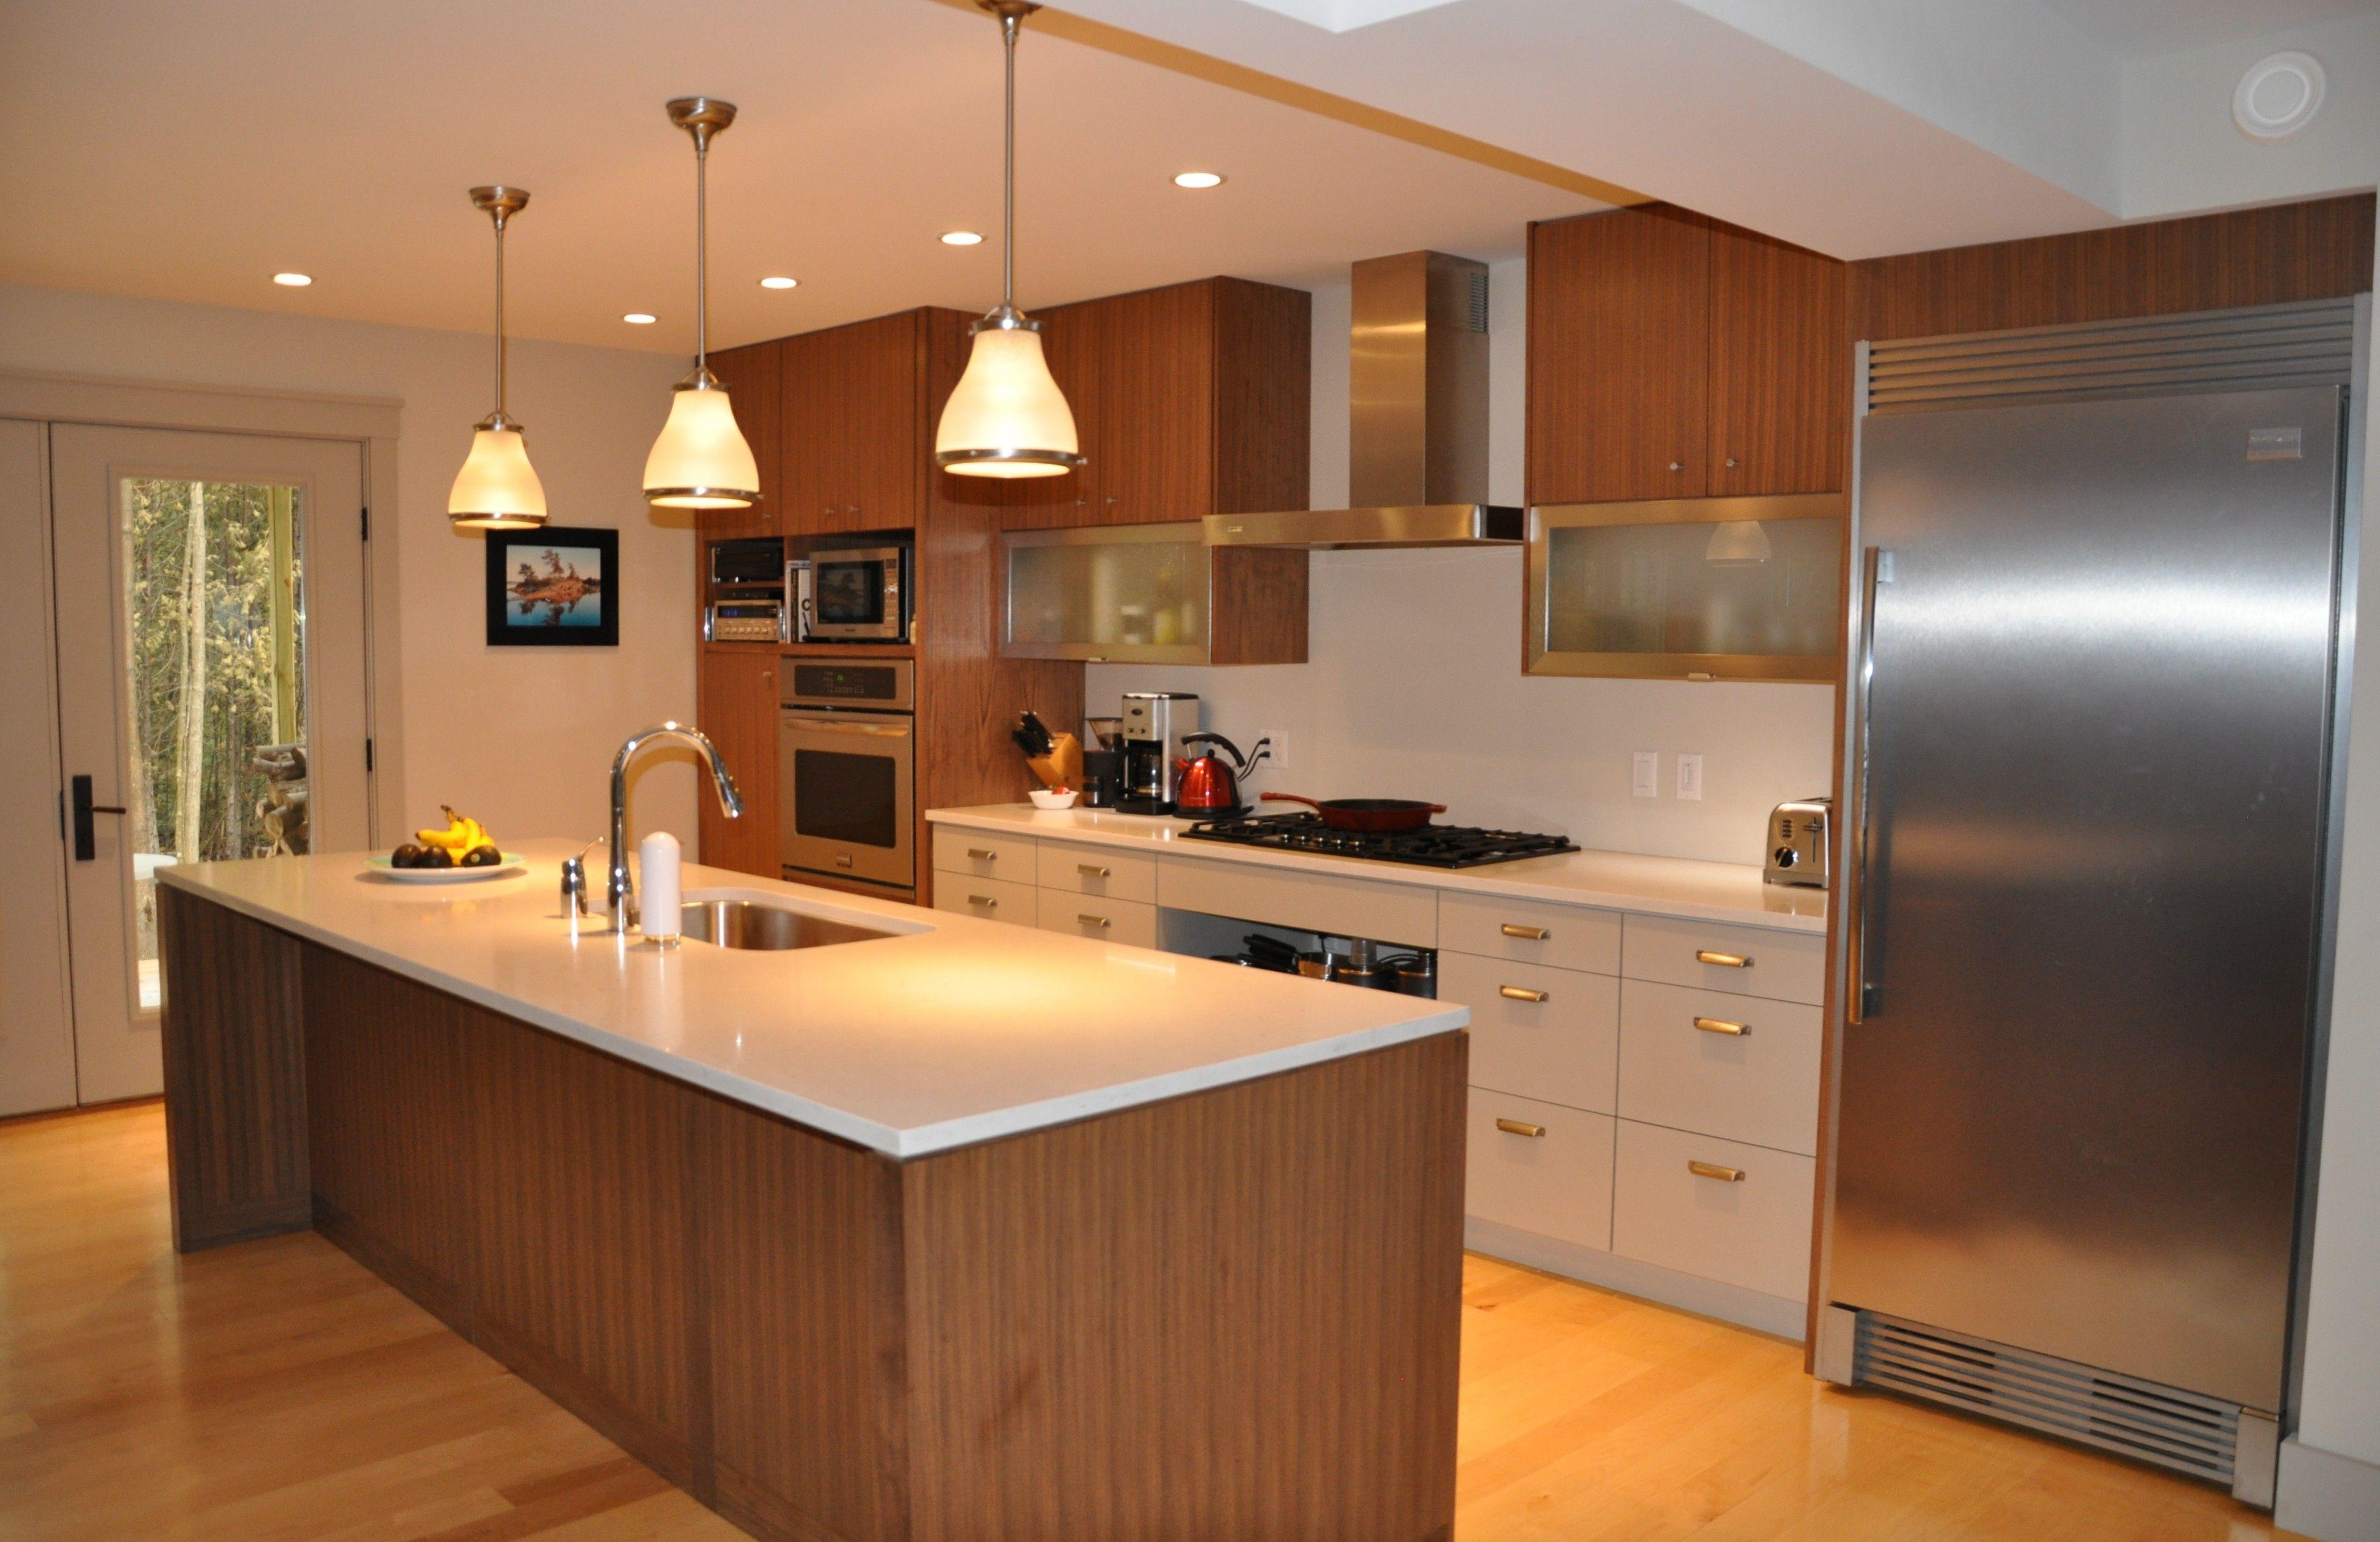 Budget Stylish Kitchen Designs  Google Search  Kitchen Extension Custom Kitchen Designs On A Budget Design Ideas